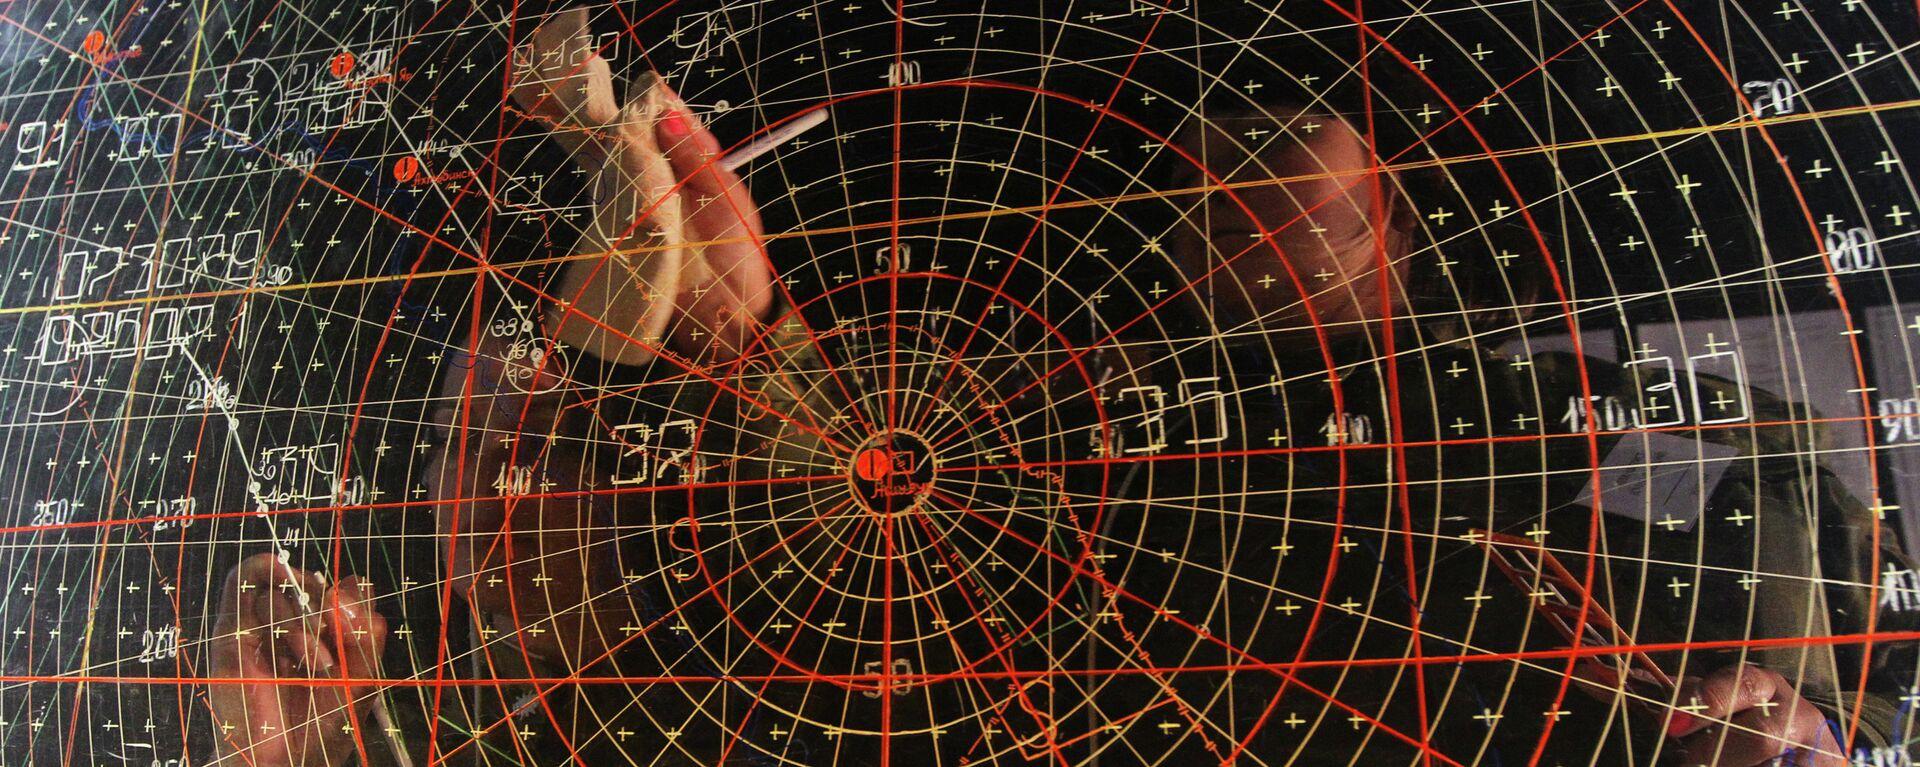 Un radar, imagen referencial - Sputnik Mundo, 1920, 31.03.2021